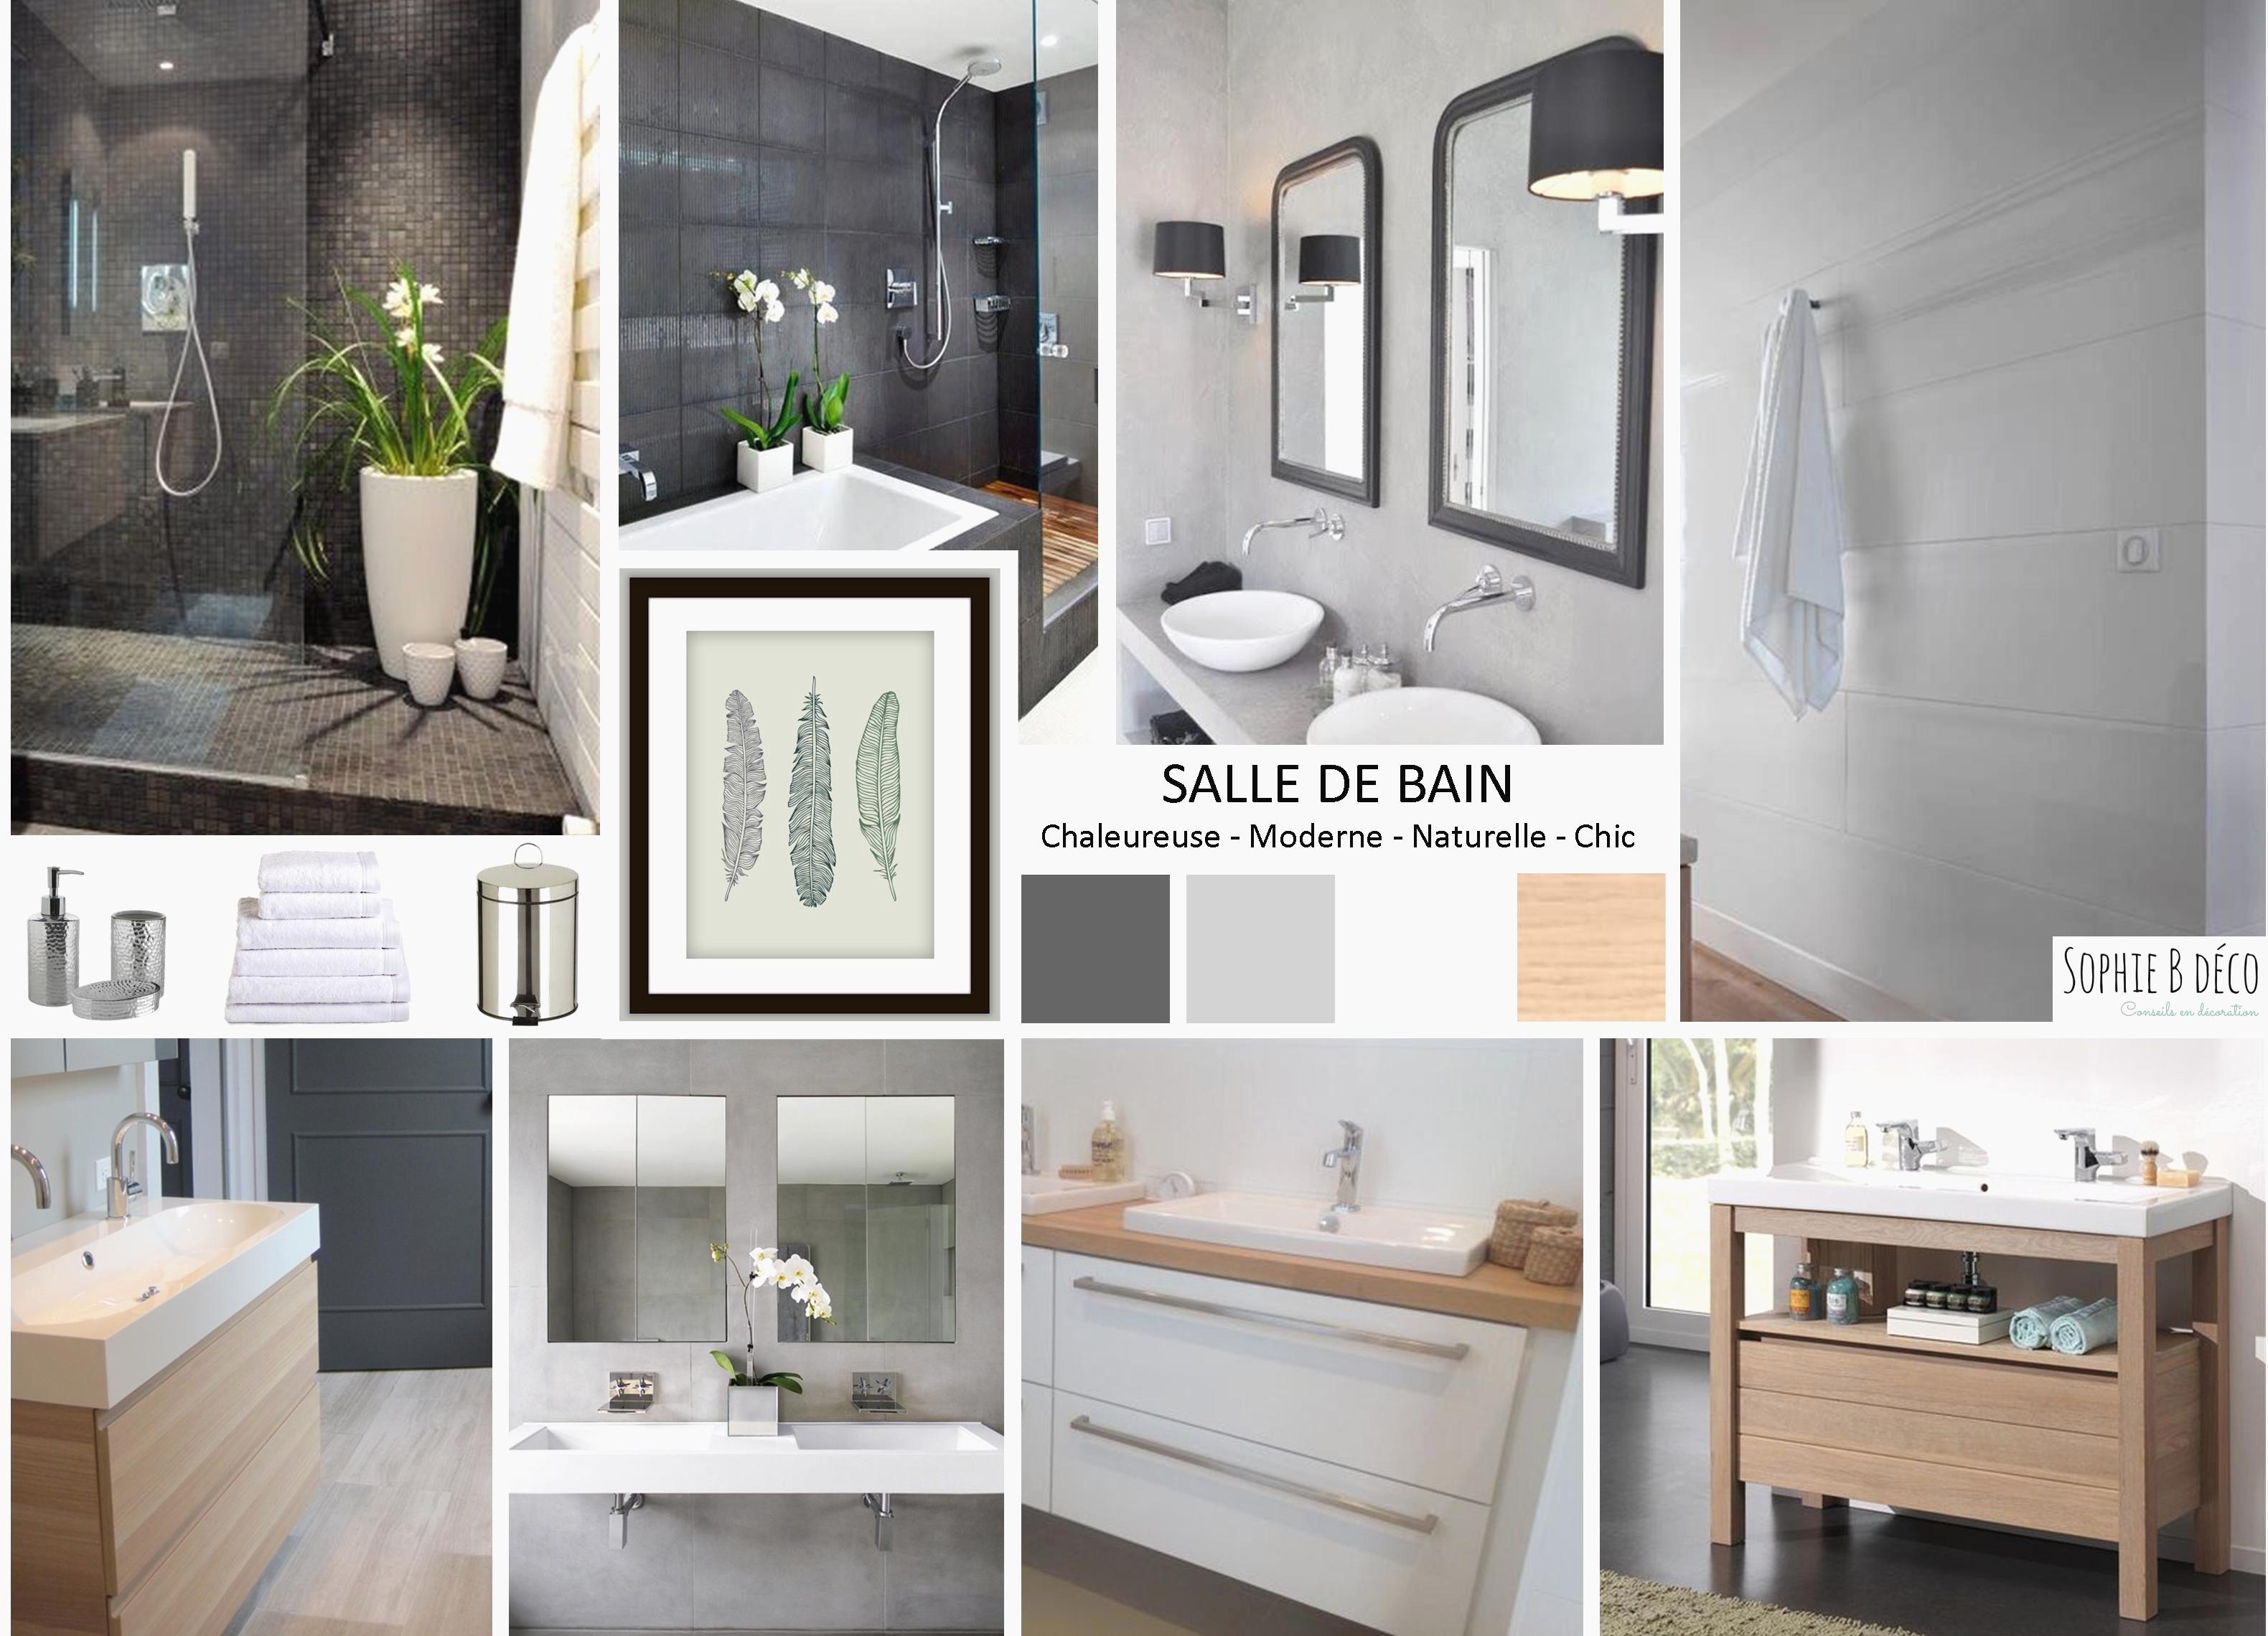 Meuble Vasque Salle De Bain Ikea Beau Images Vasque Salle De Bain Ikea